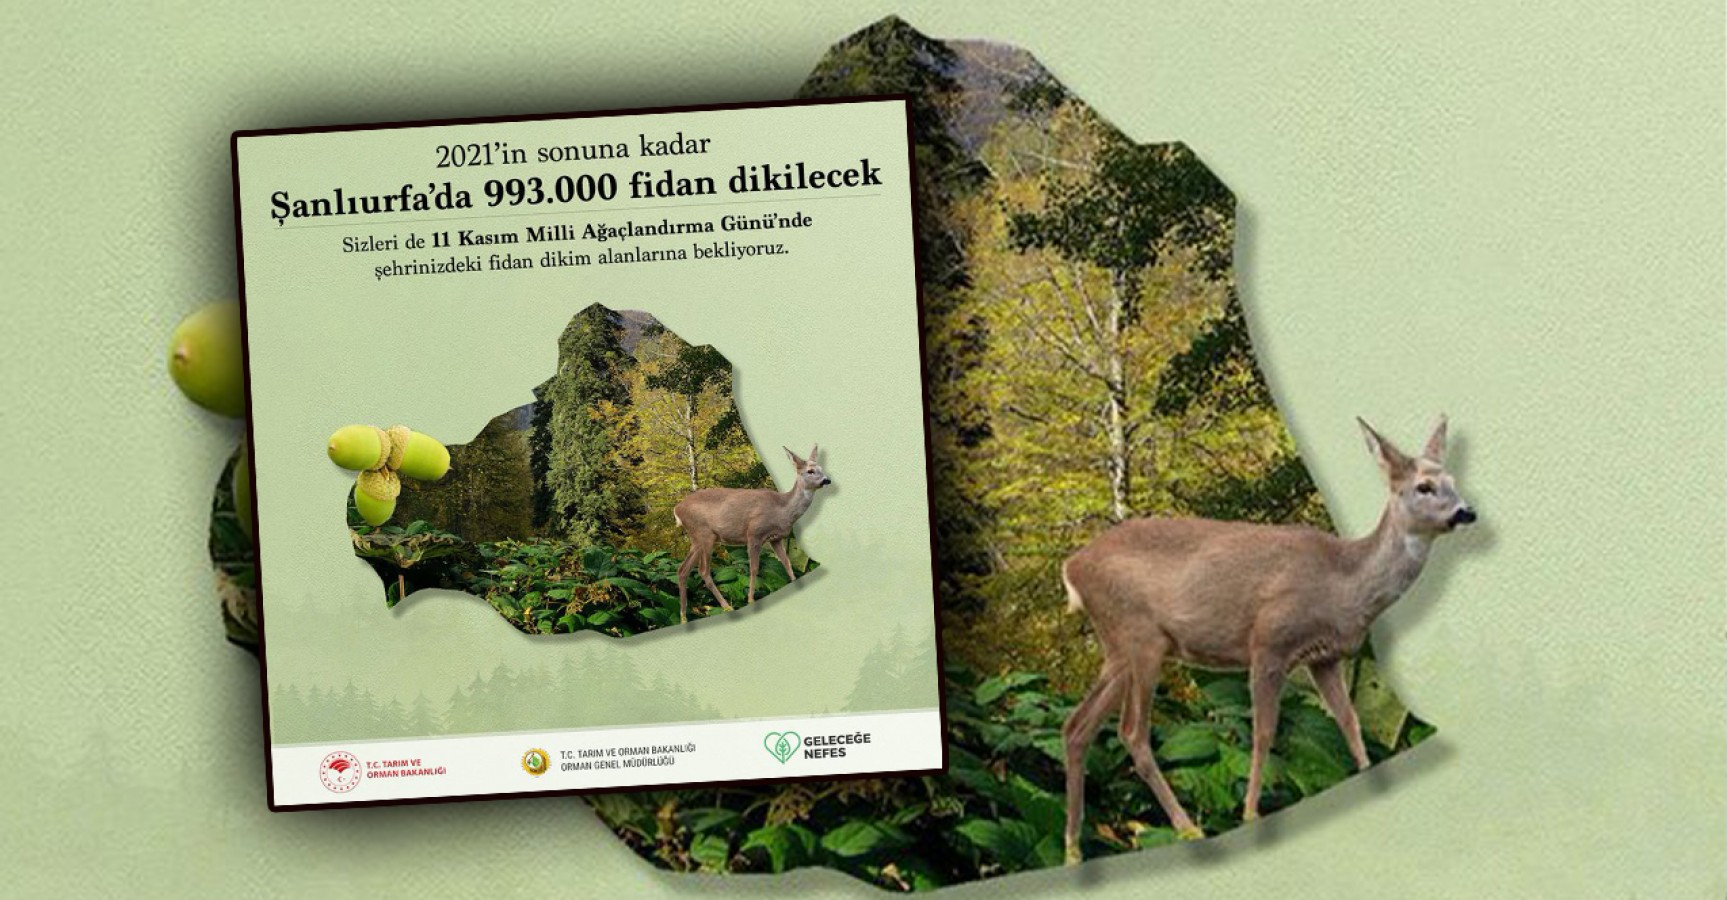 Urfa'da 993 bin fidan toprakla buluşacak